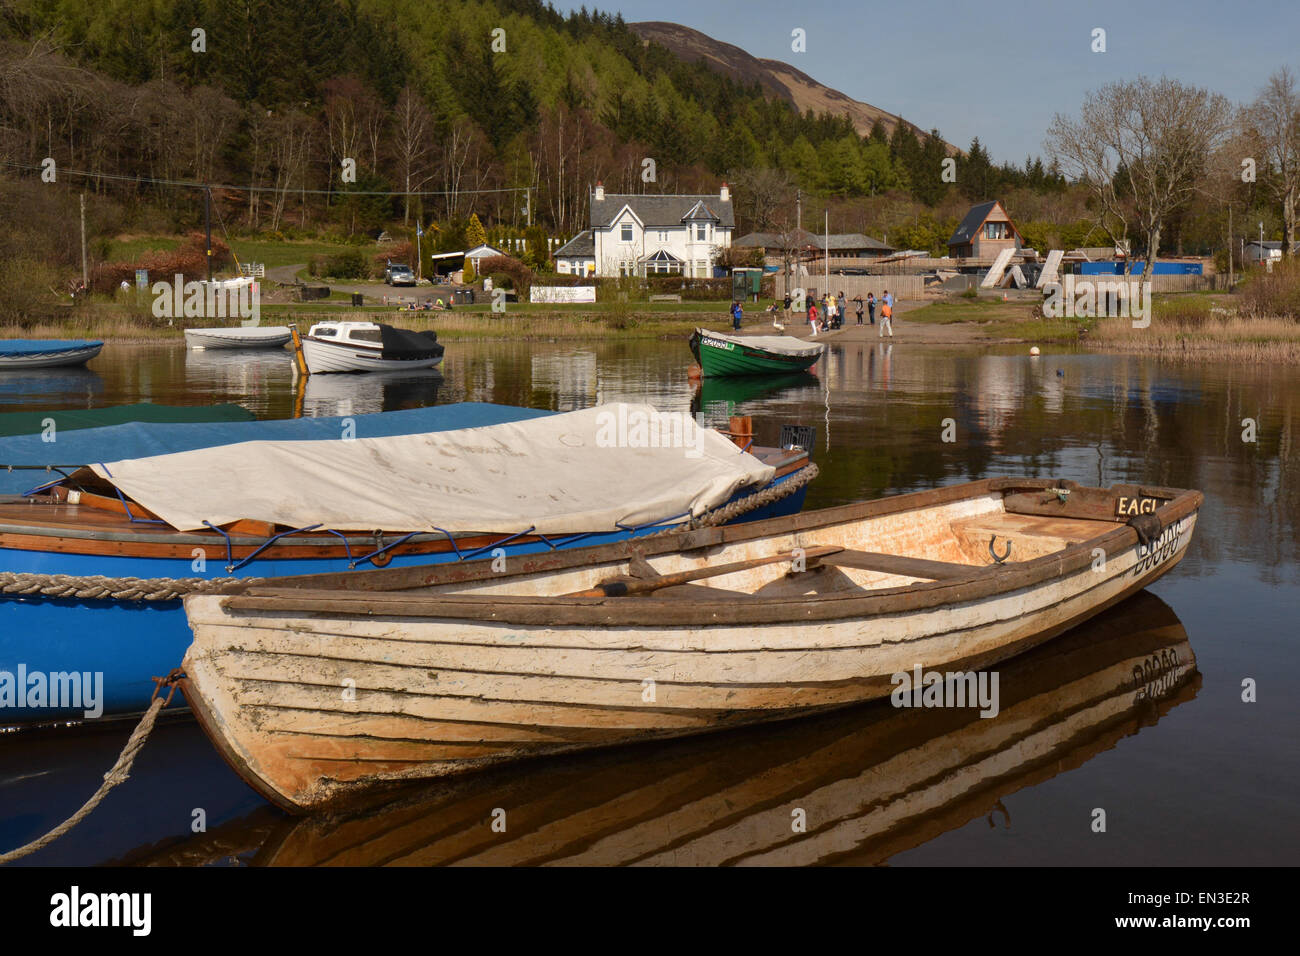 BALMAHA, LOCH LOMOND, SCOTLAND, UK - 22 APRIL 2015: Balmaha marina viewed from Balmaha boatyard on warm spring day - Stock Image